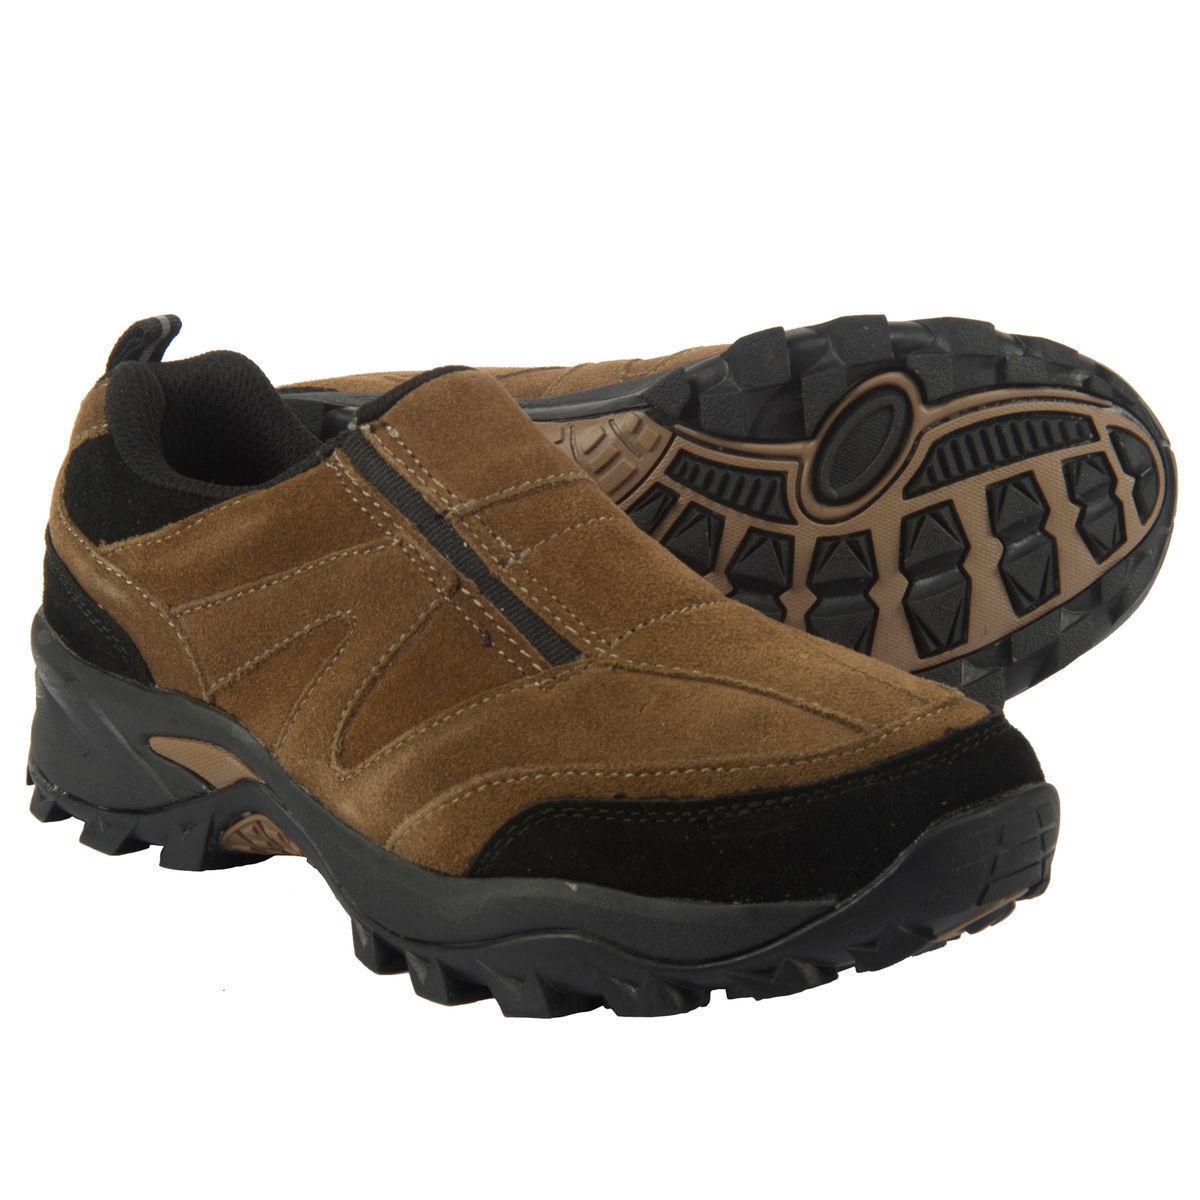 Gander Mountain Womens Everyday Slip  On Moc Brown Size 6 NIB  100% fit guarantee